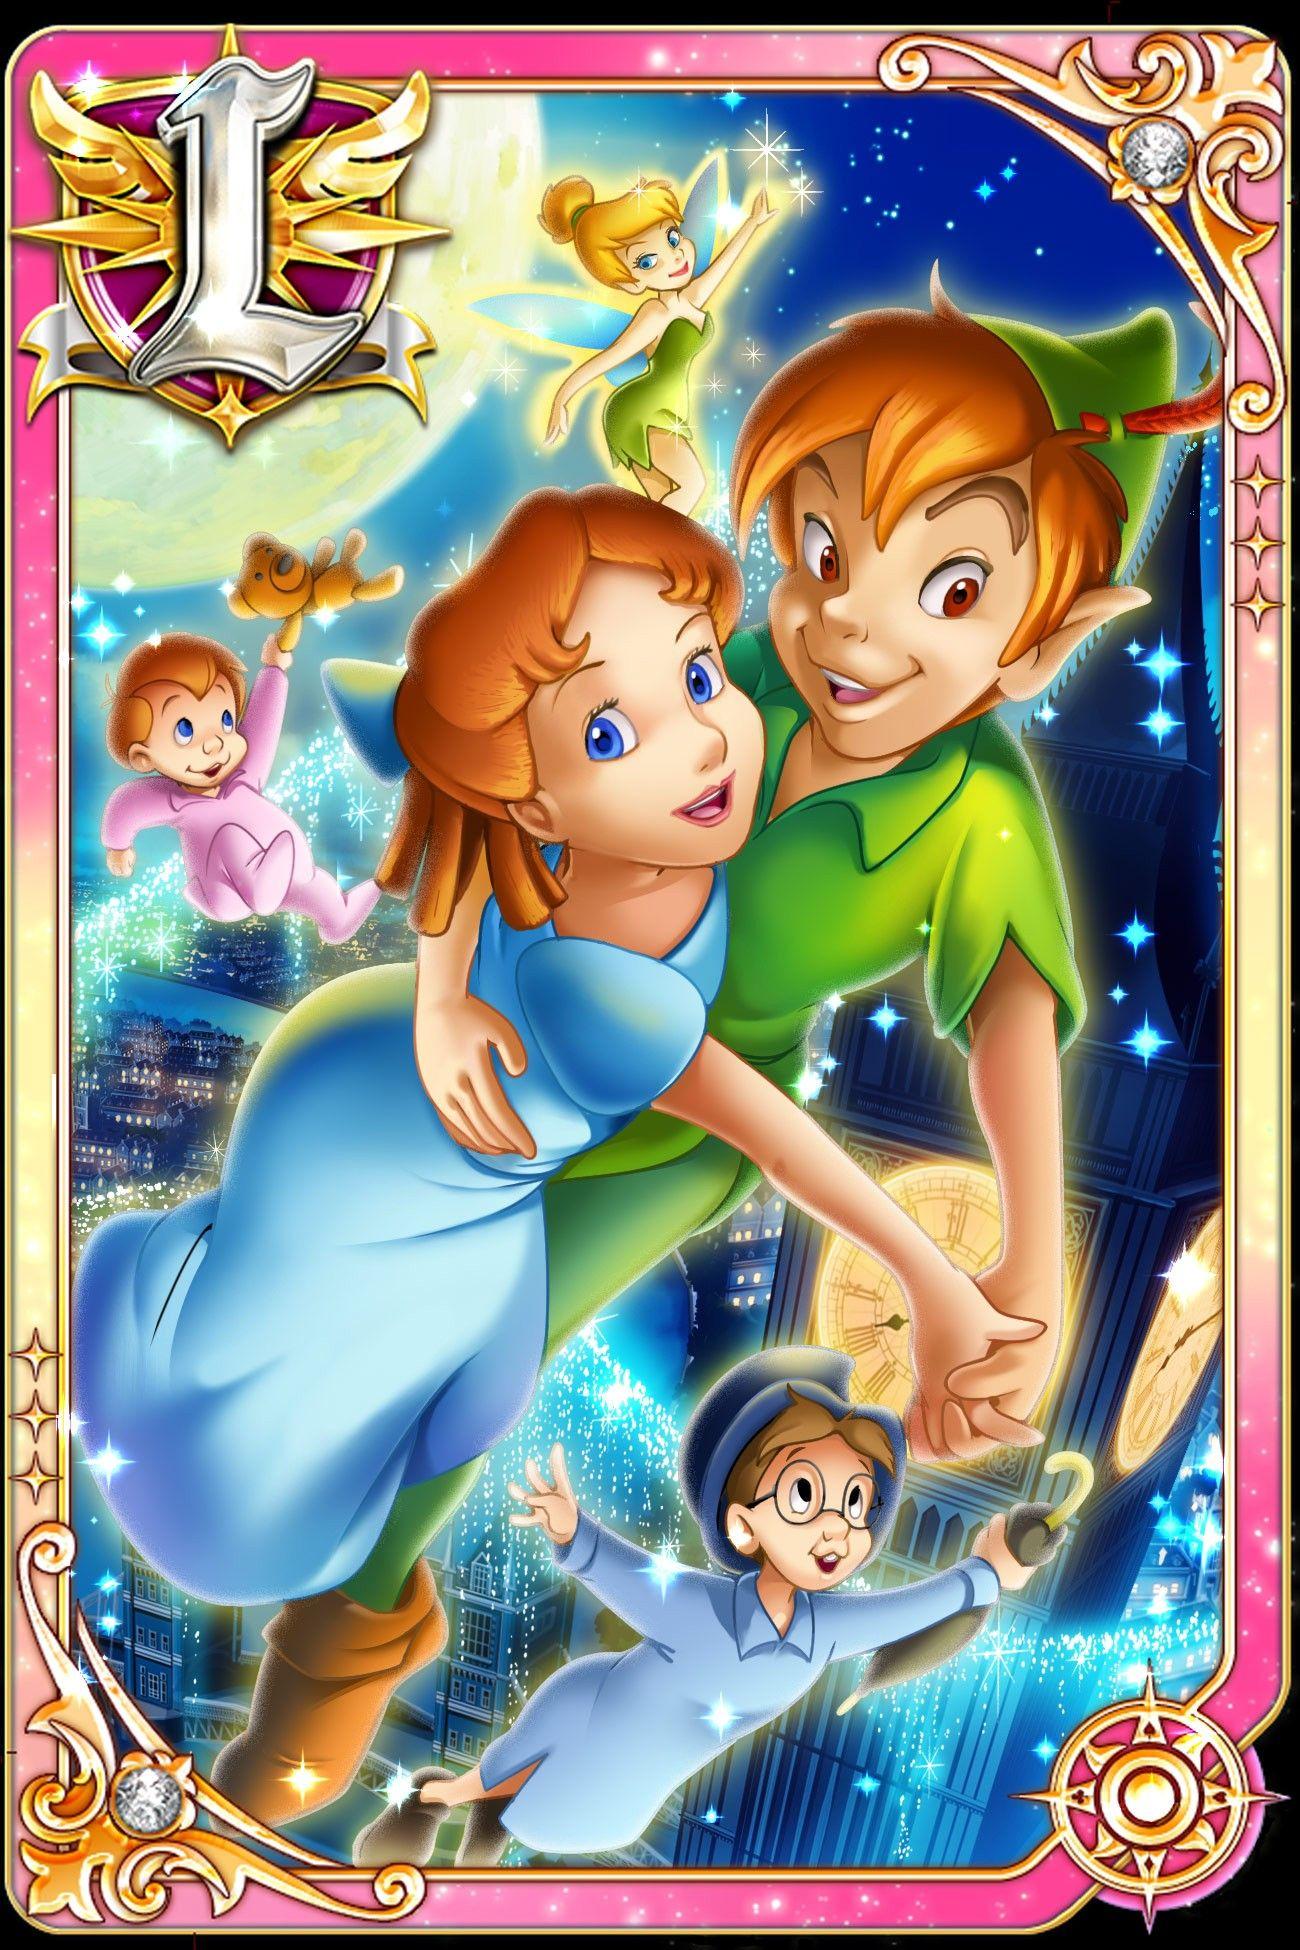 Image du tableau Disney de Princess Luchia Nanami 🌹 | Disney, Fond d'écran iphone disney, Fond d ...